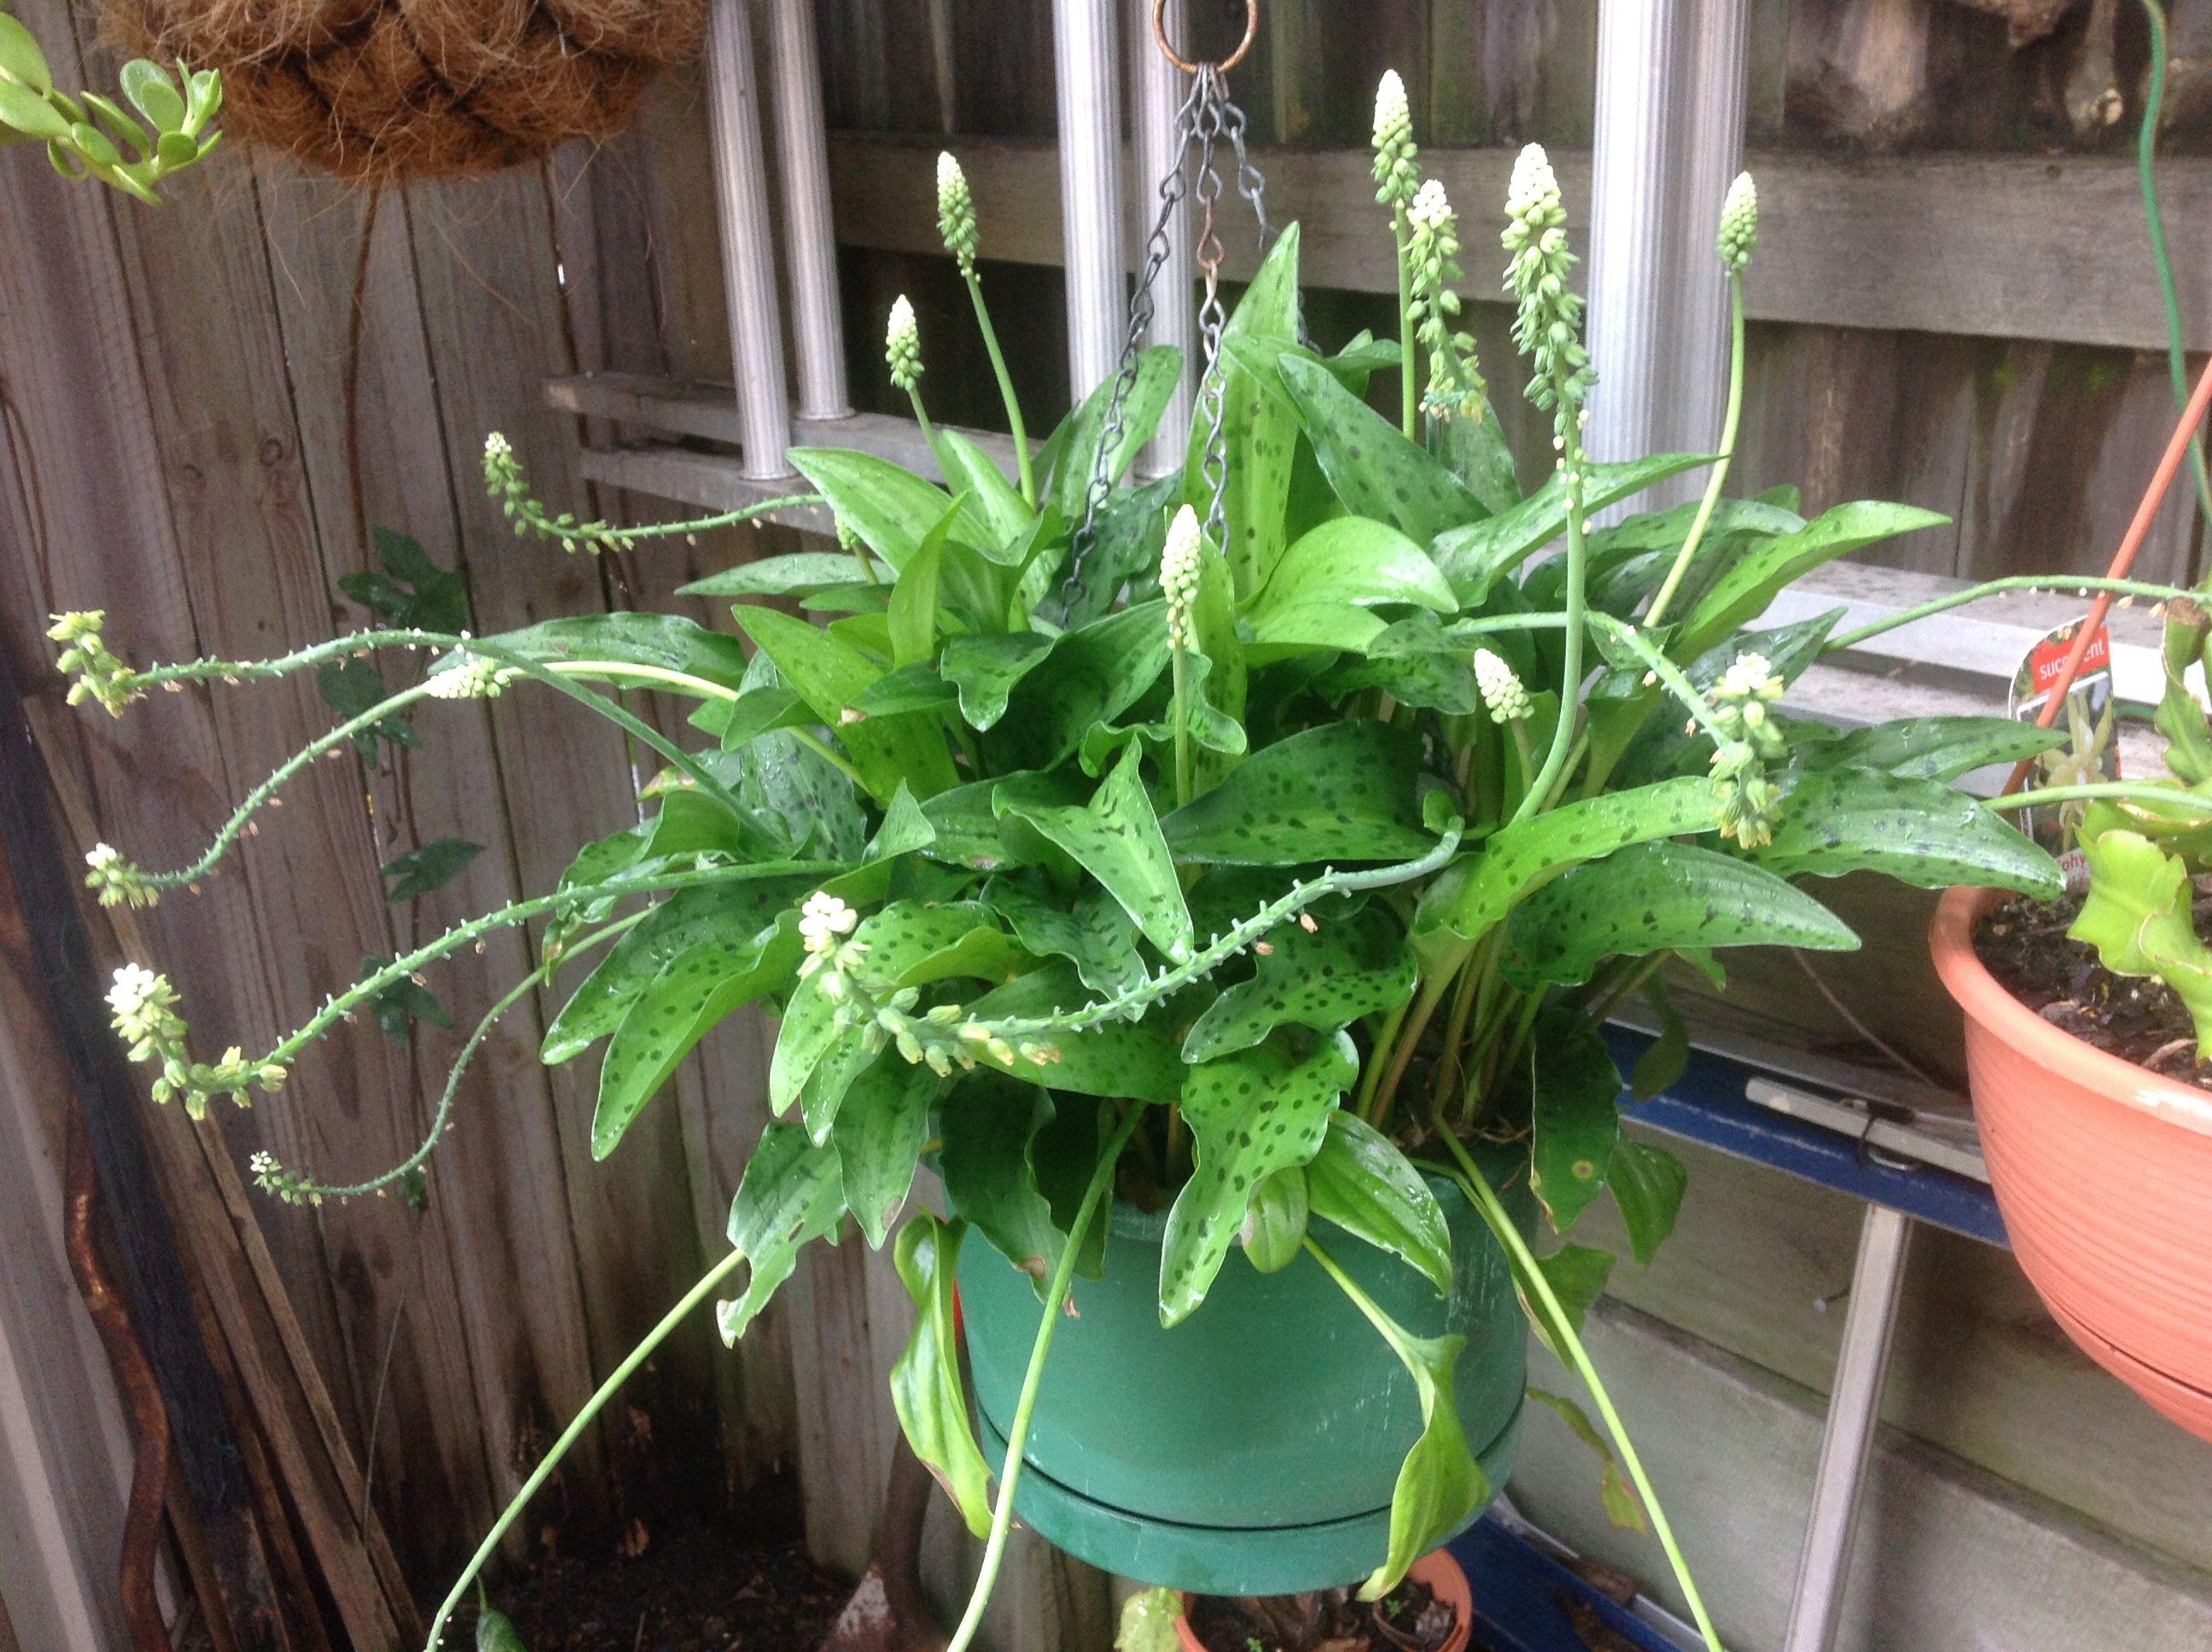 Цветок дримиопсис пятнистый: фото, уход в домашних условиях